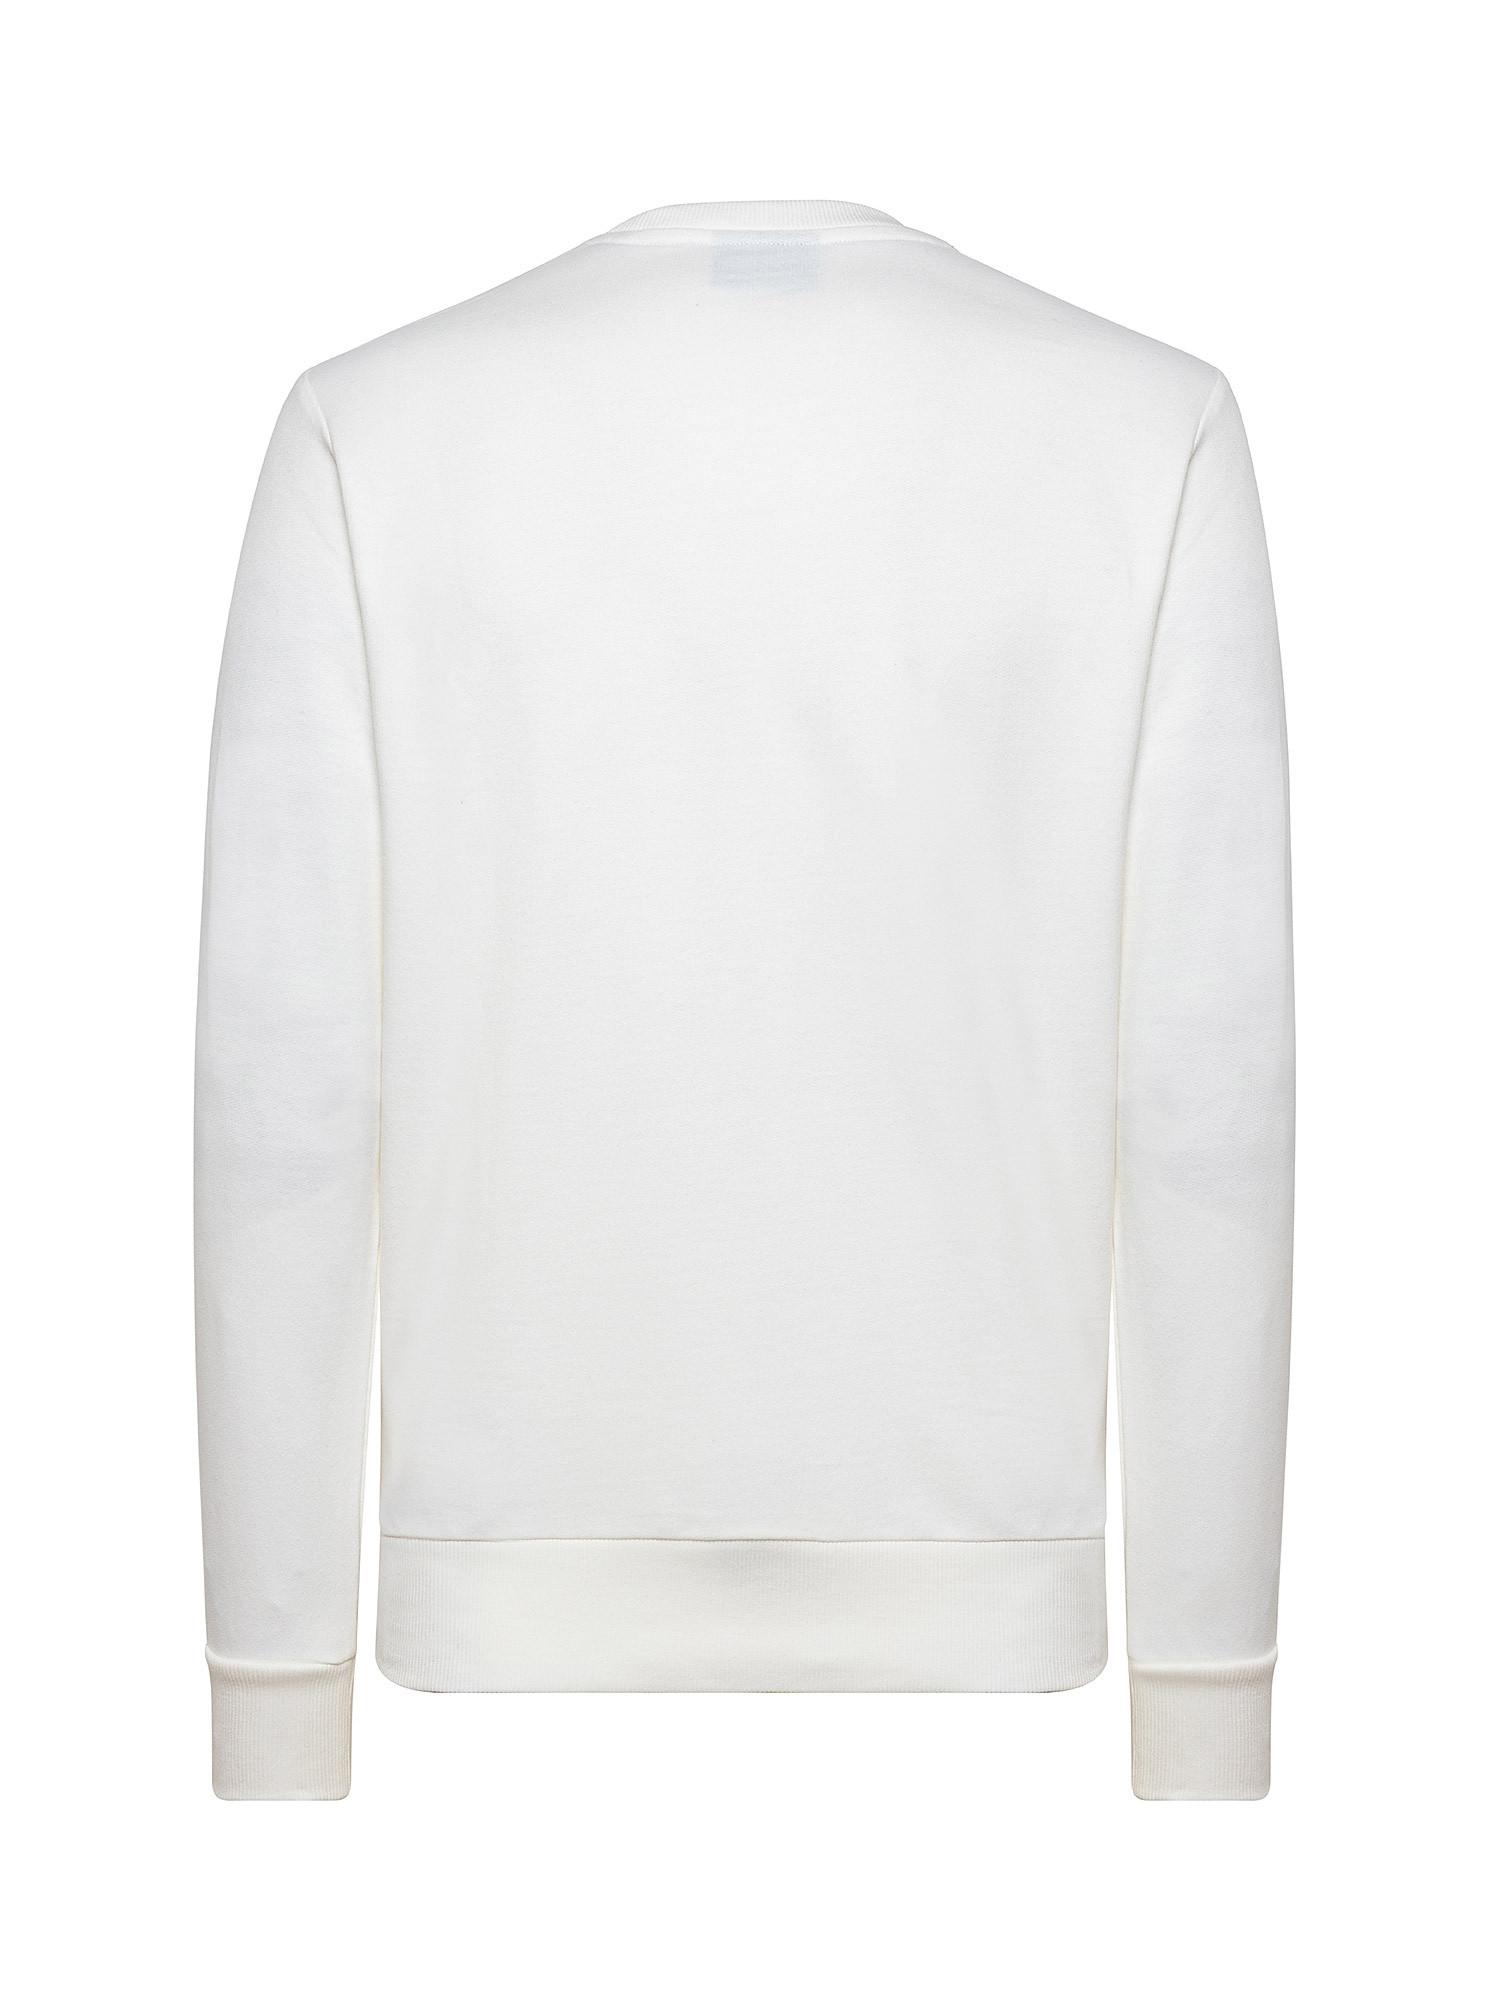 Maglioncino uomo regular fit, Bianco, large image number 1